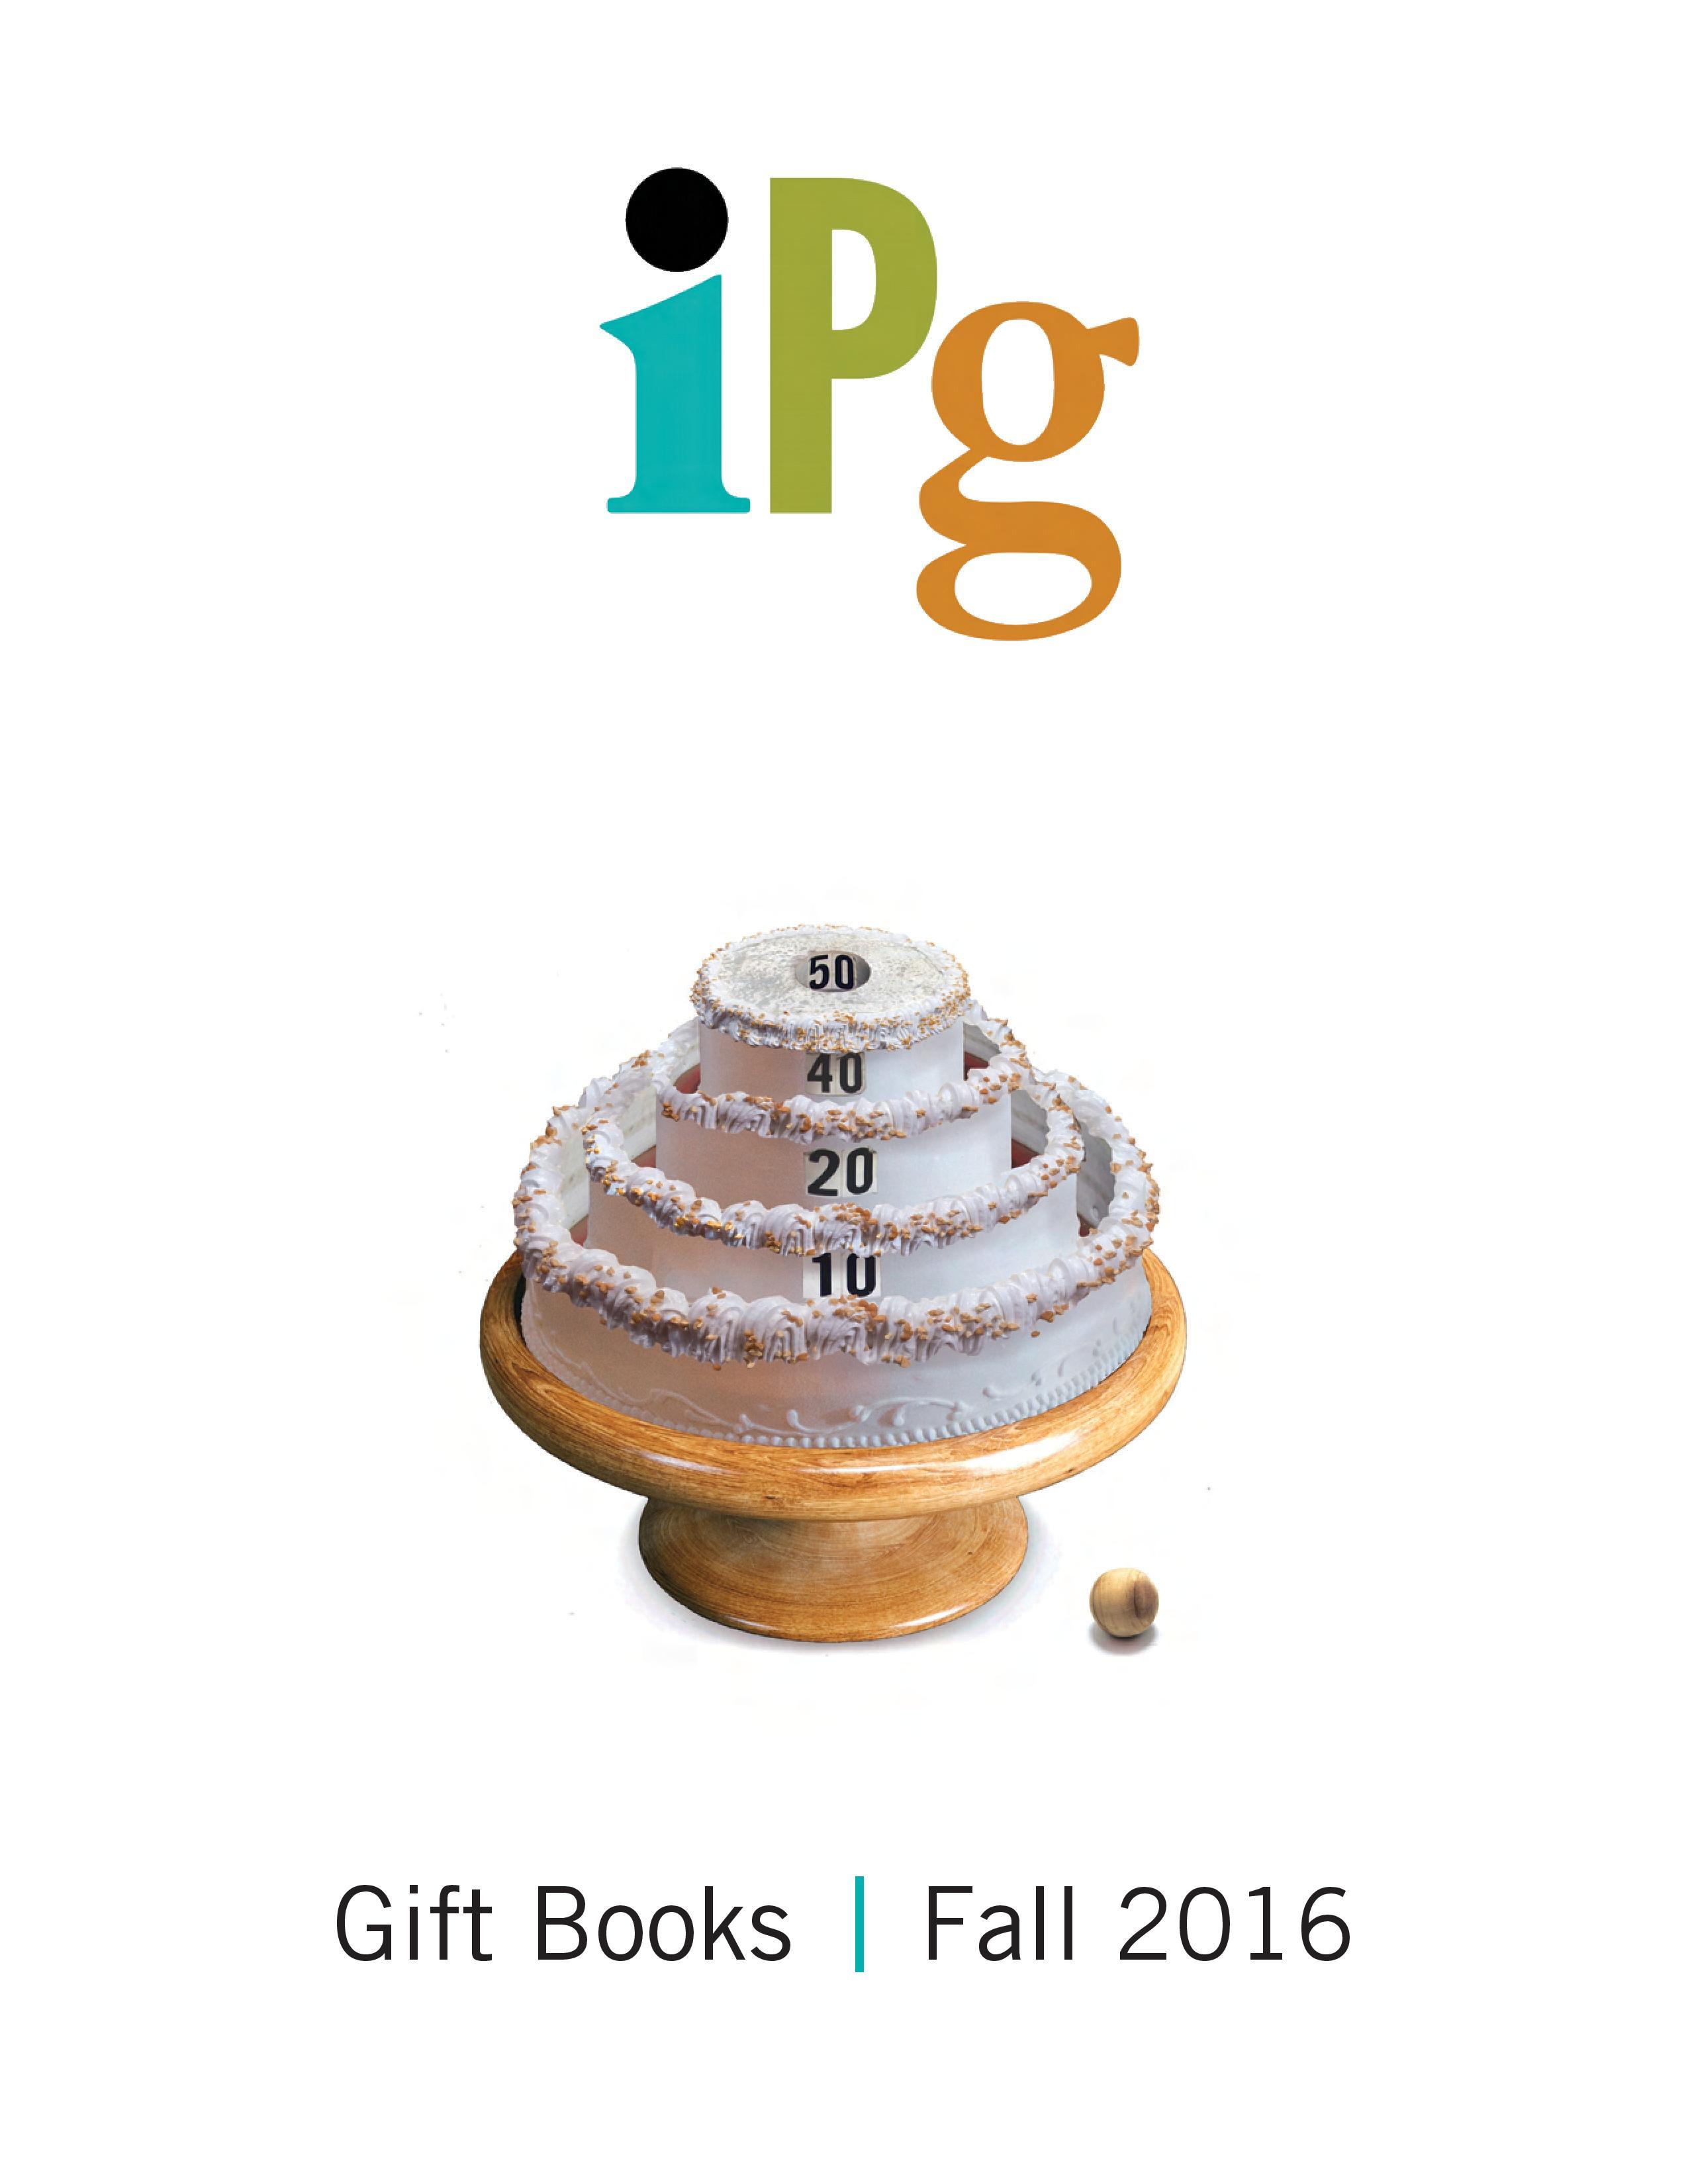 Fall 2016 Gift